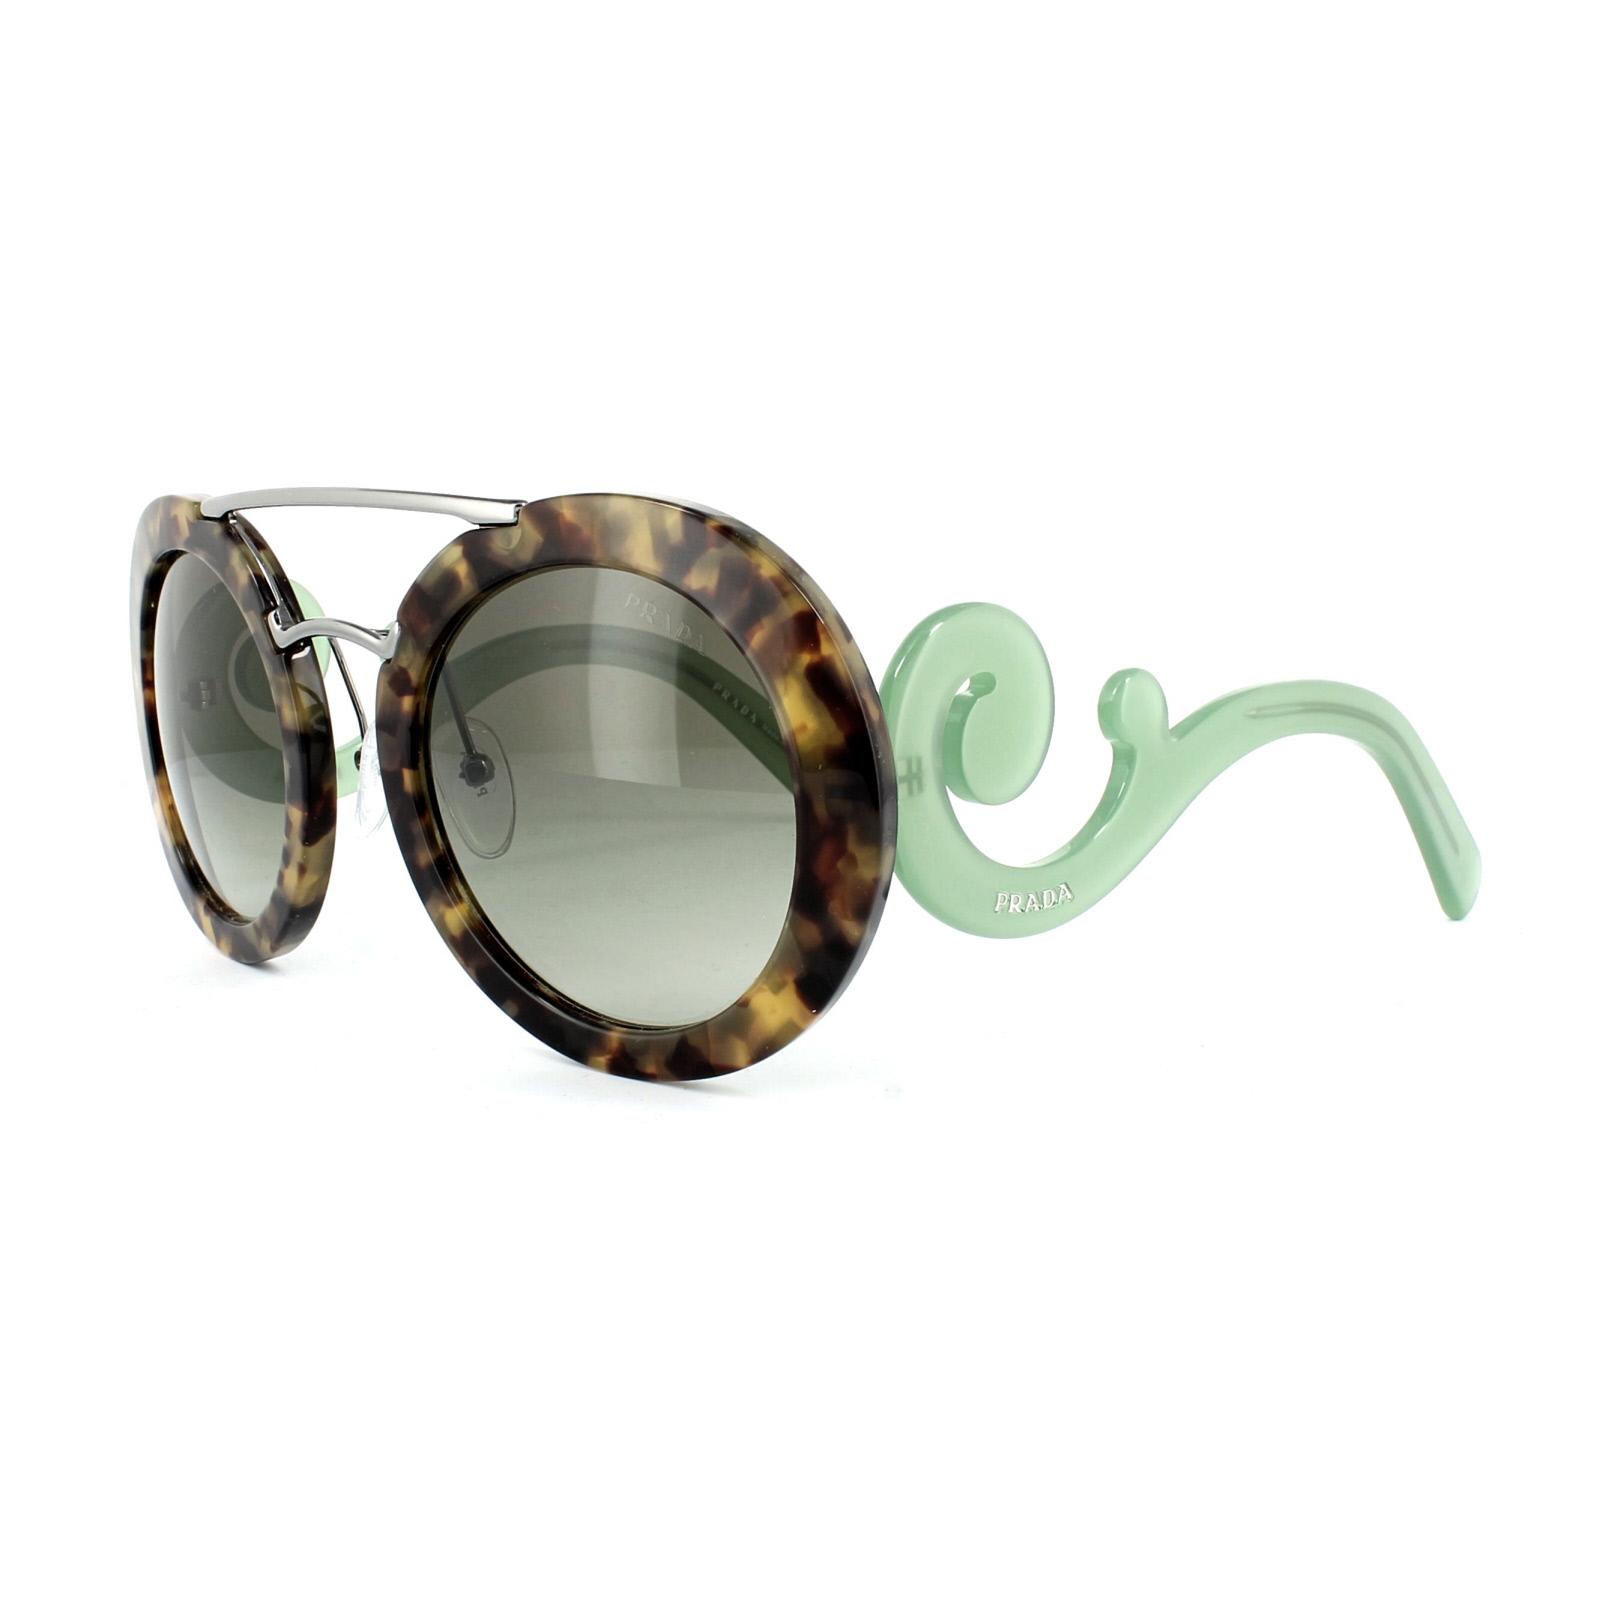 2f9275142642 Sentinel Prada Sunglasses 13SS UEZ4K1 Spotted Brown & Green Grey Green  Gradient